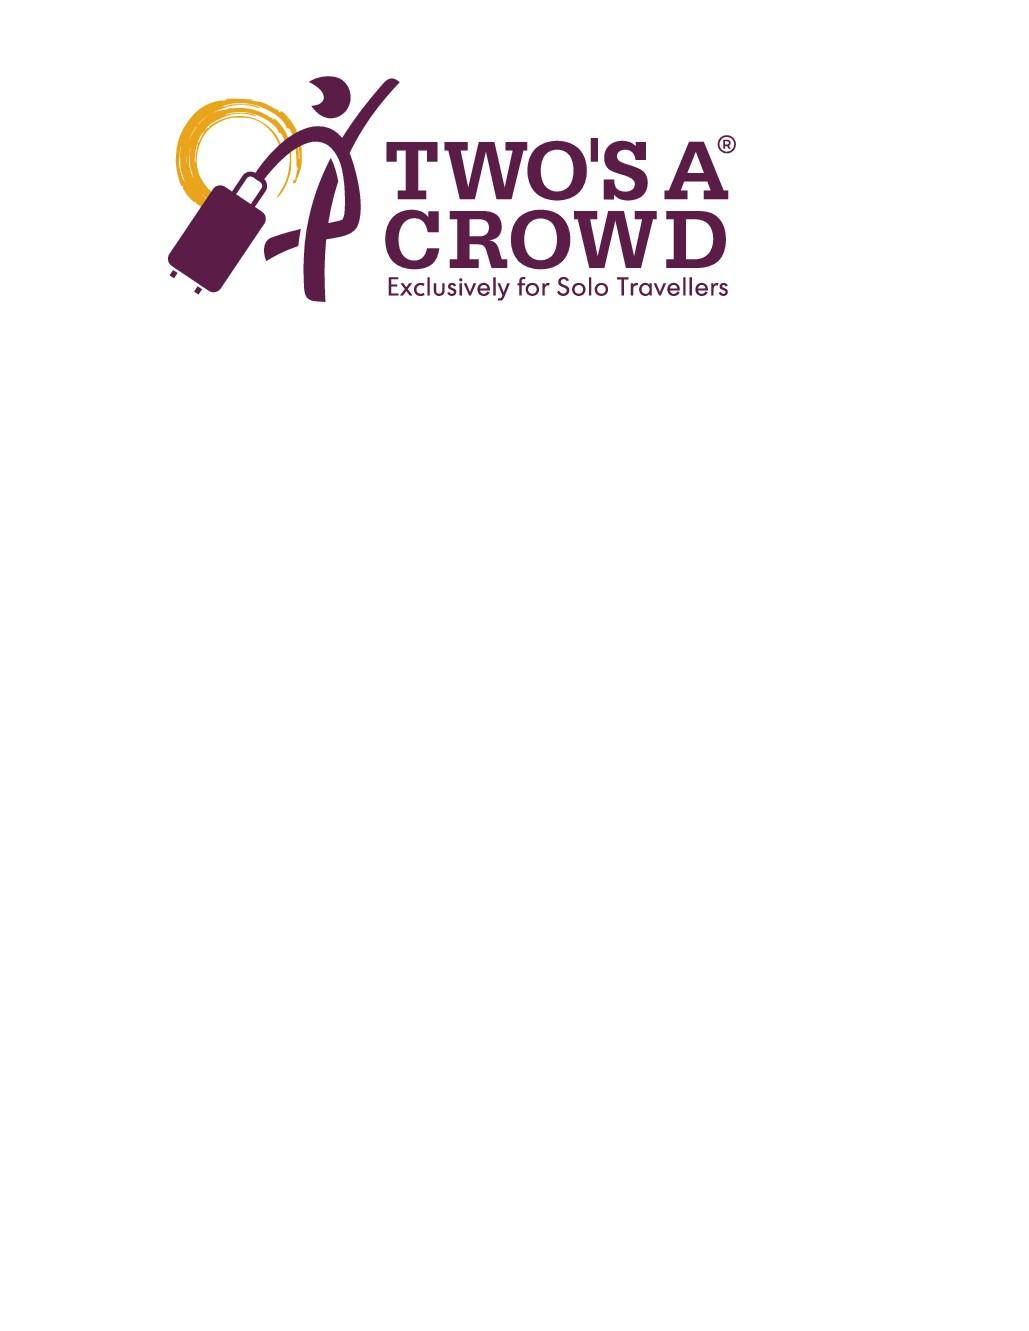 Solo travel tour specialist logo re-design